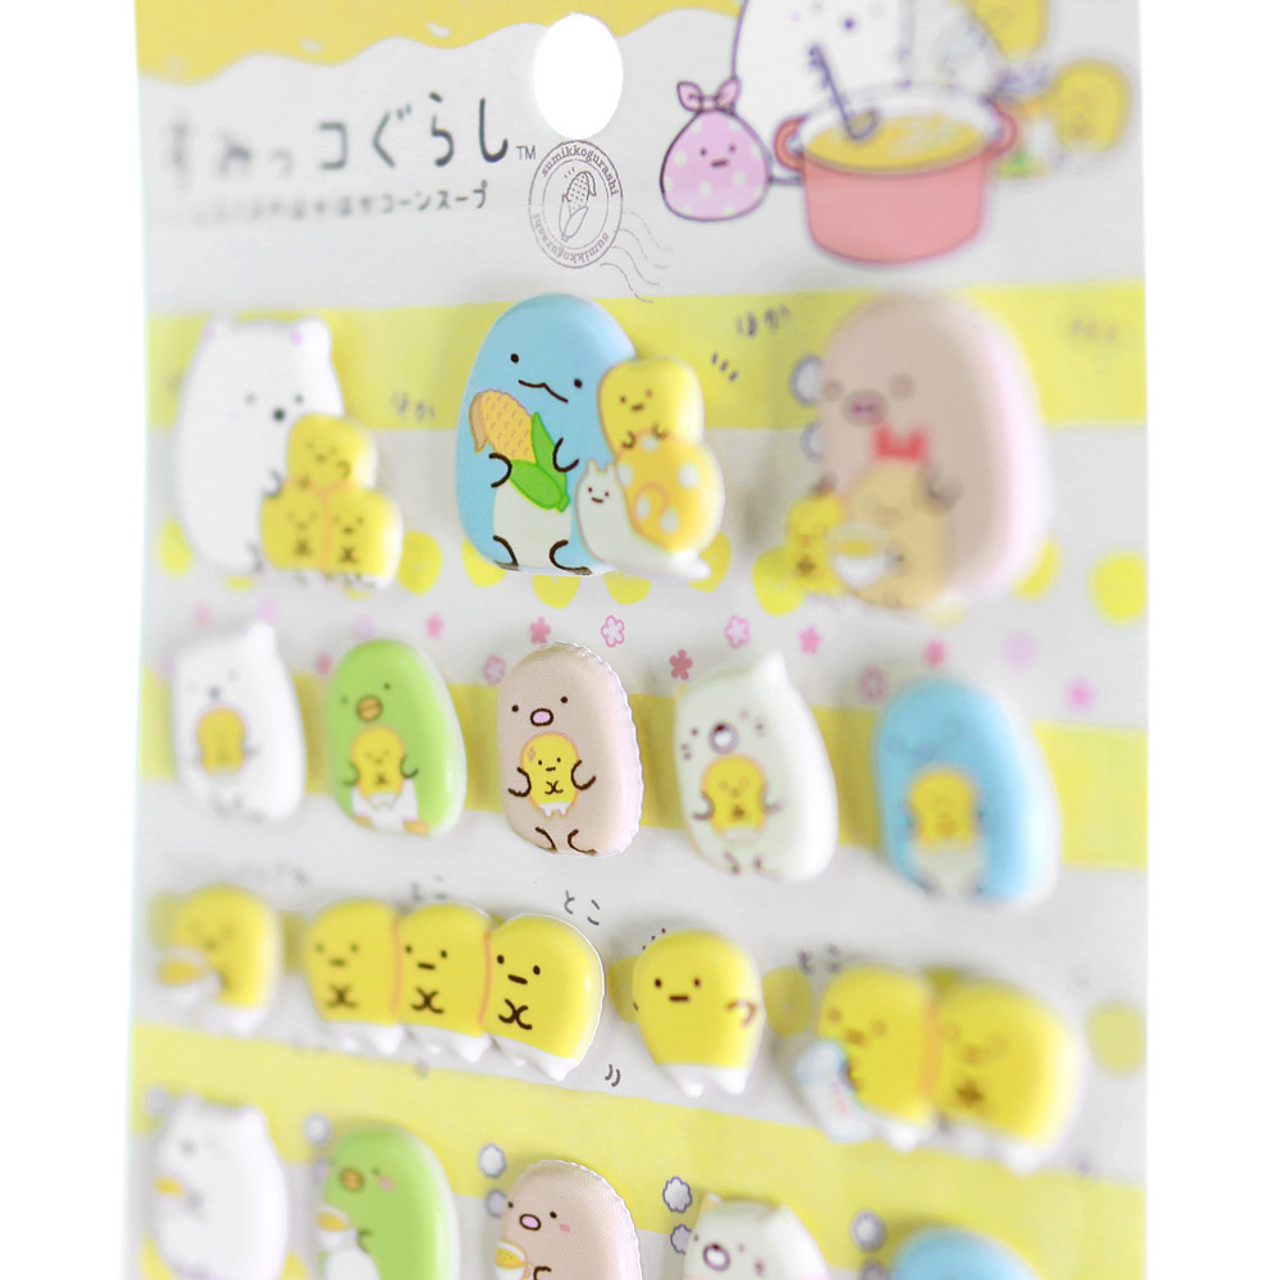 Sumikko Gurashi Funny Collection Sticker SE49201 - Corn ( Close-up 01 )